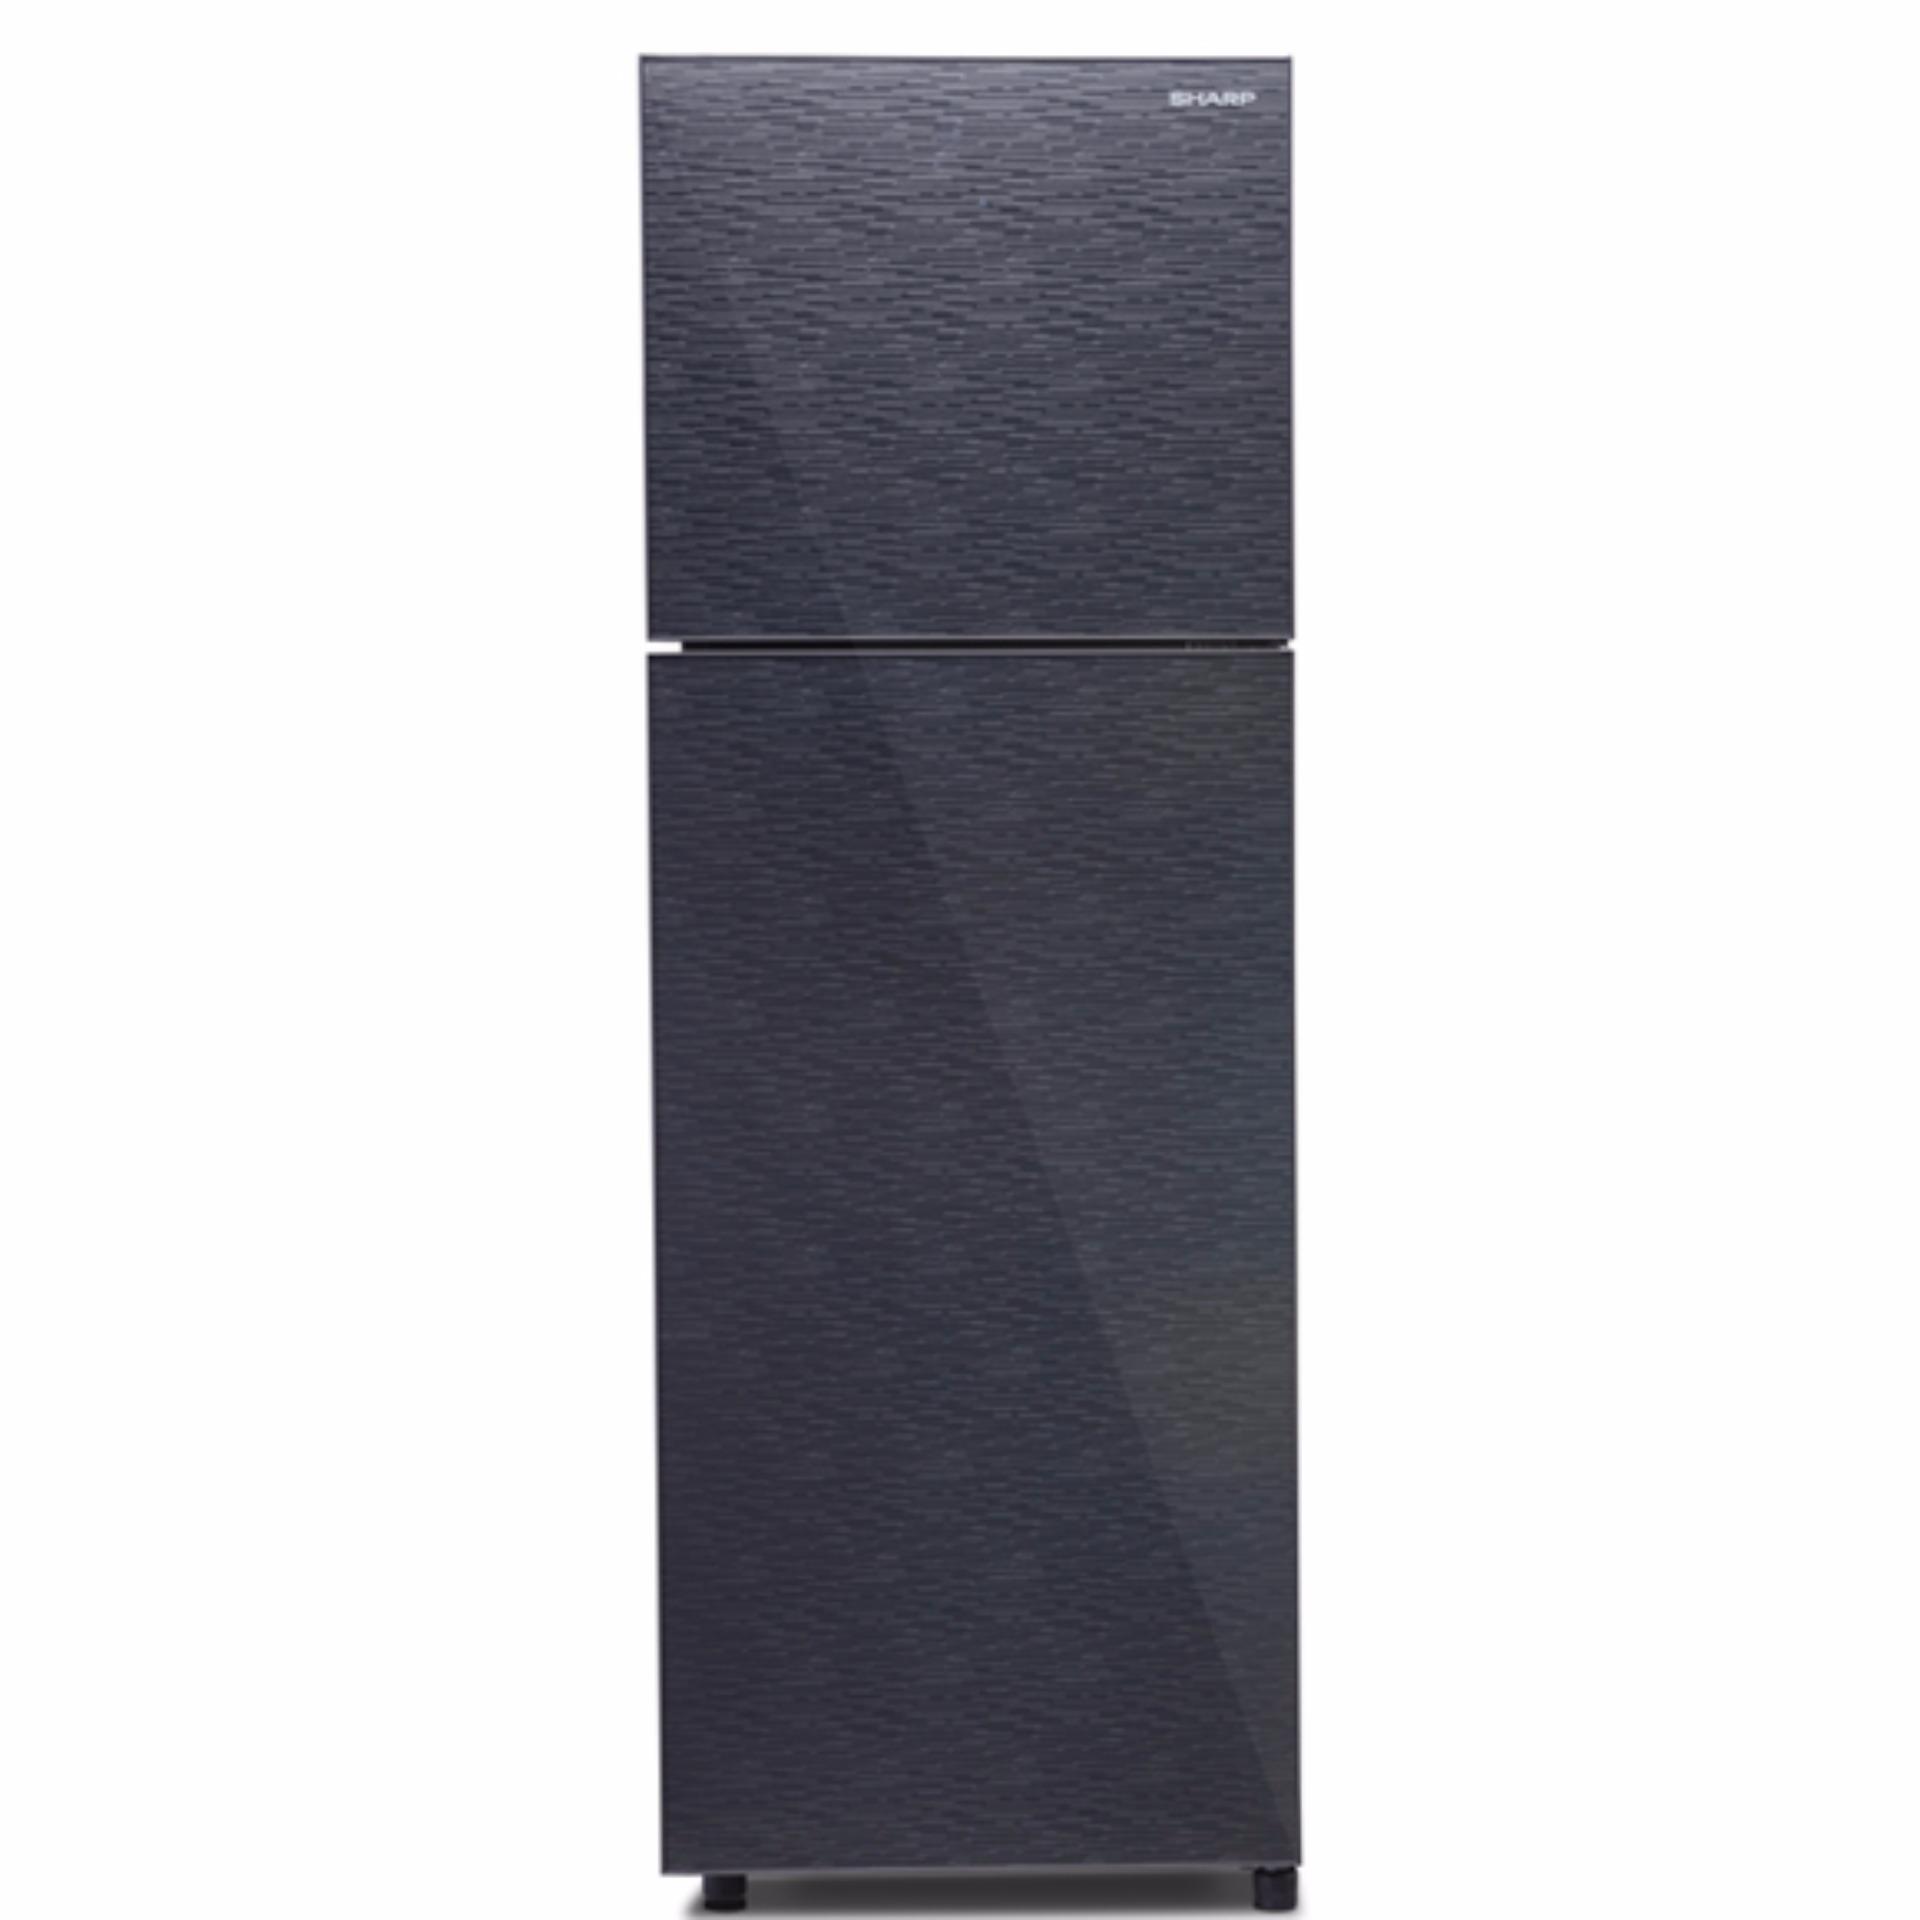 Sharp Sjx185mg Refrigerator Kulkas 1 Pintu Shine Series Biru Best One Door Sjn166ffb Flash Sale Lemari Es 2 Sj 246xg